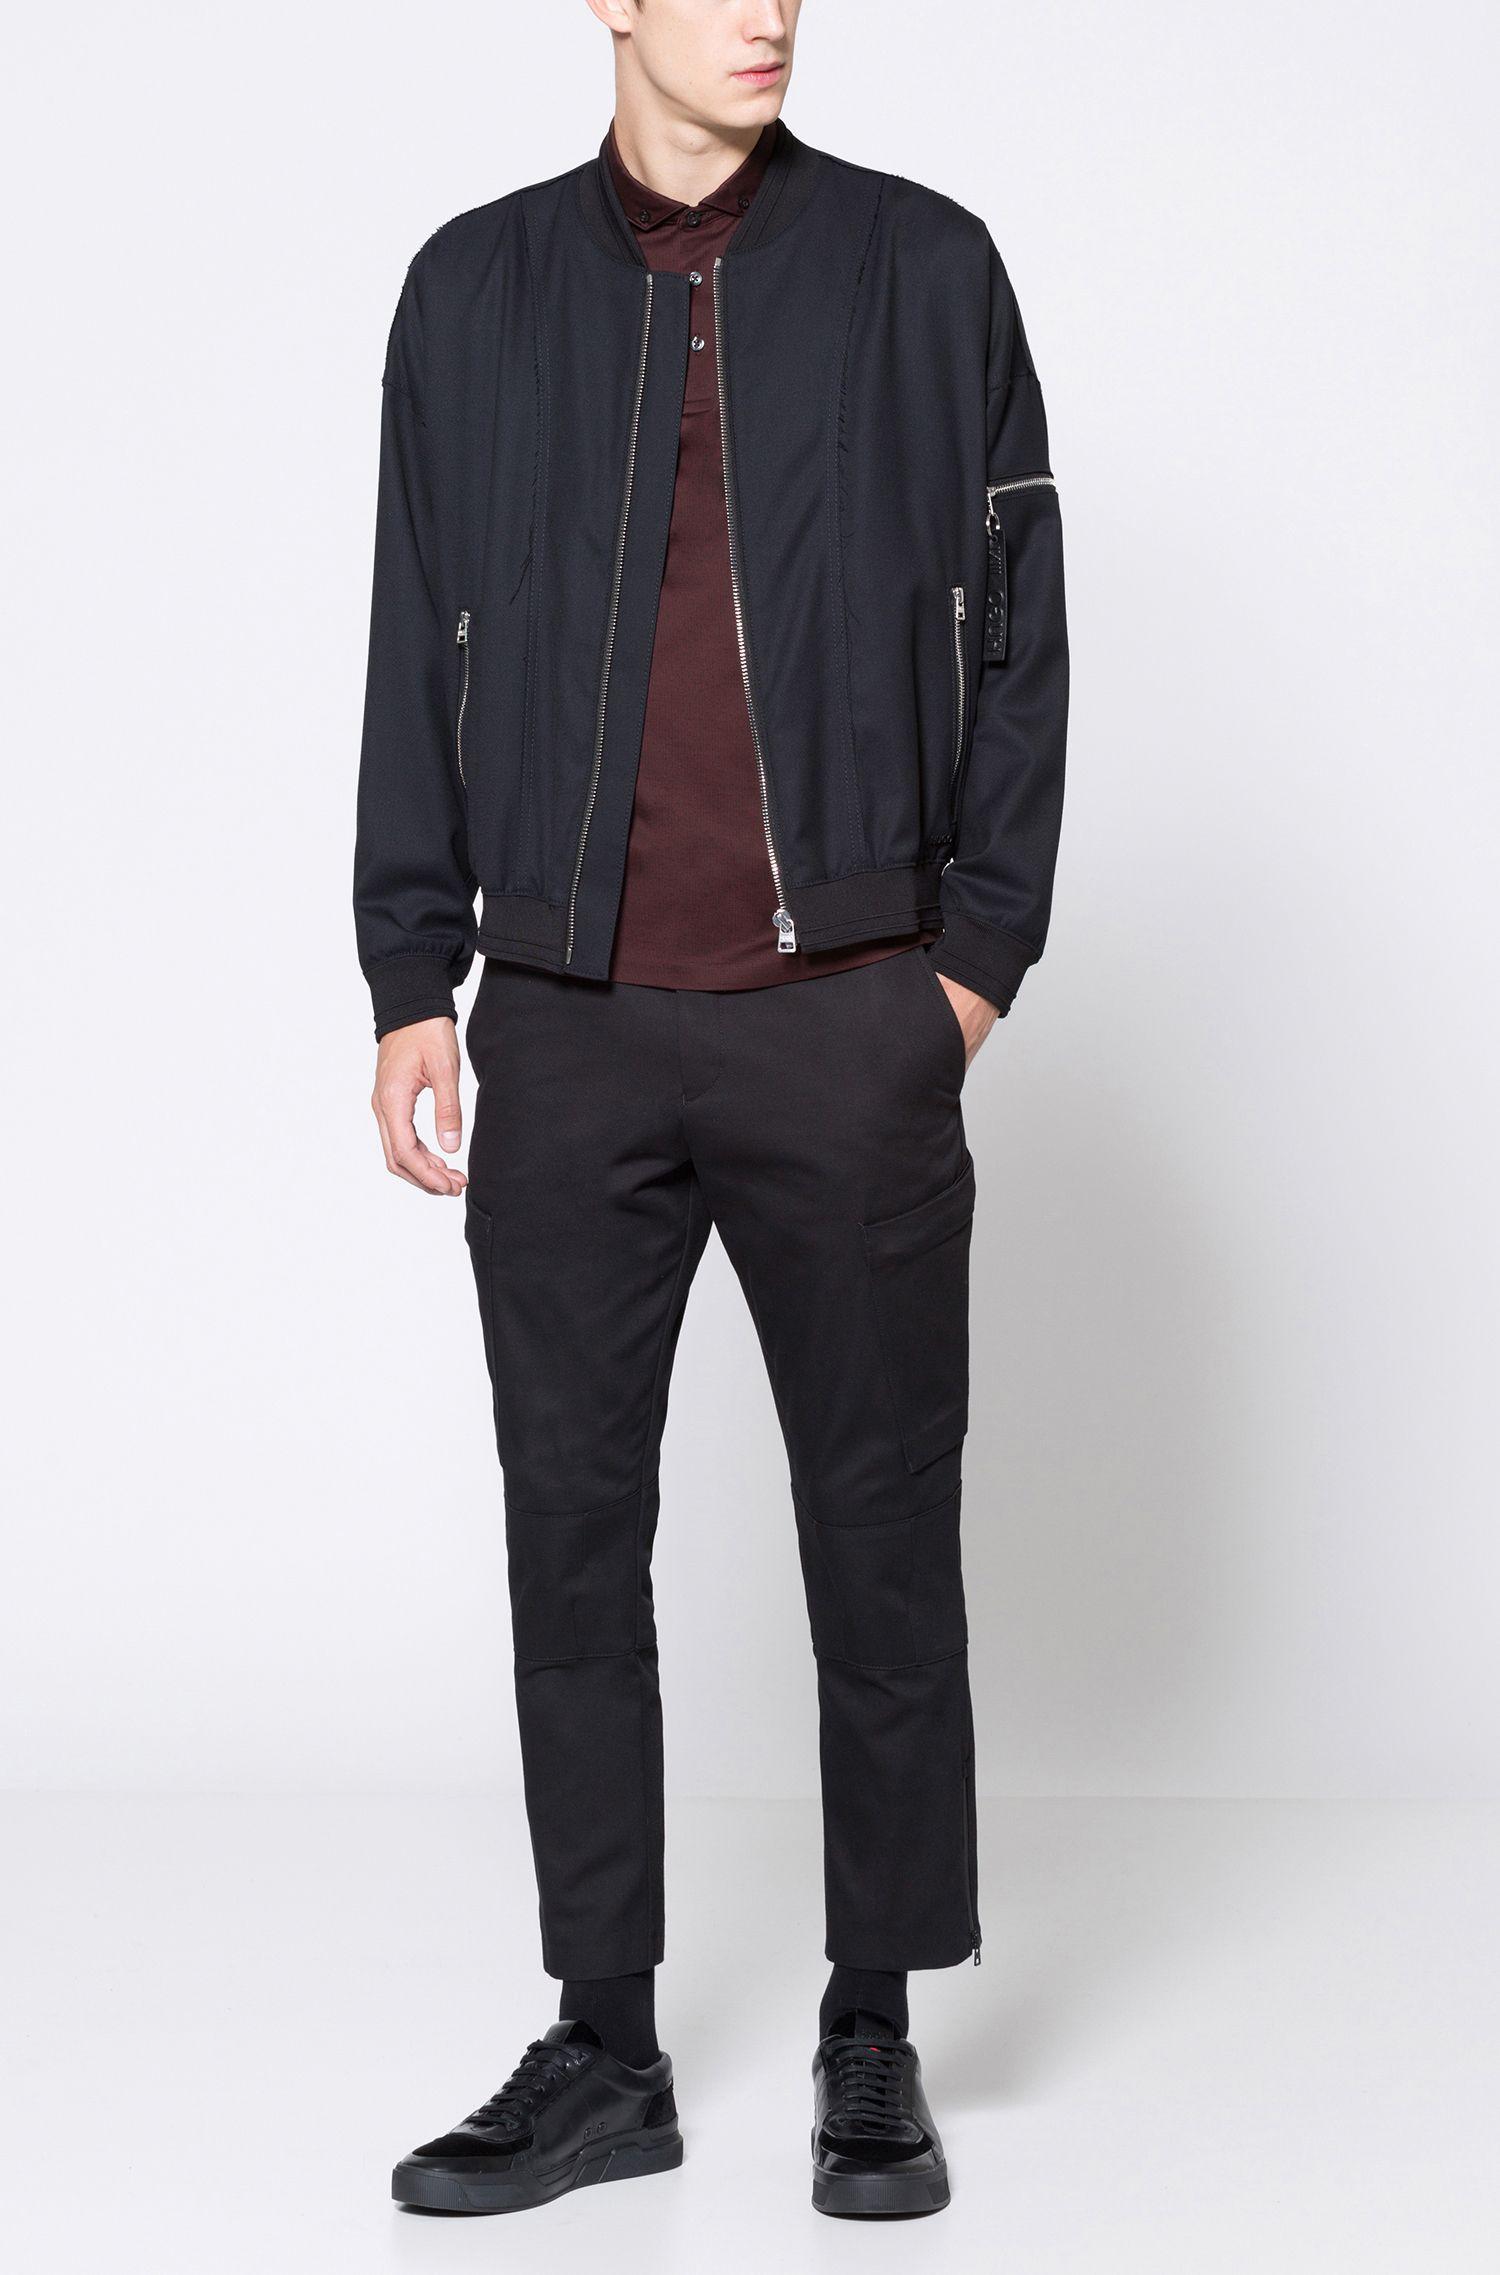 Jacquard Mercerized Cotton Polo Shirt, Regular Fit | Dogart